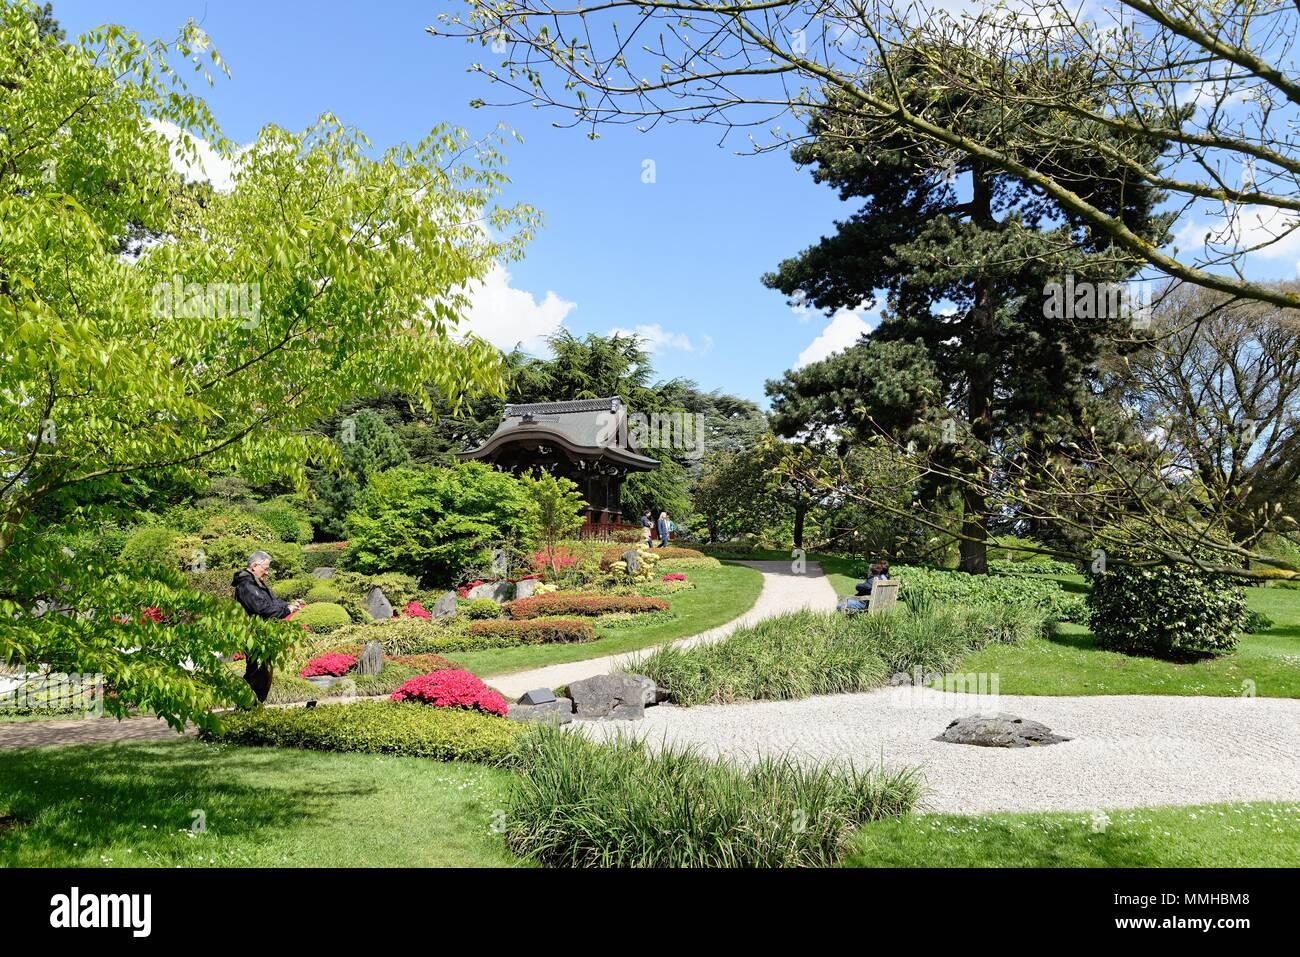 The Japanese Garden in the Royal Botanic Gardens, Kew Greater London England UK - Stock Image